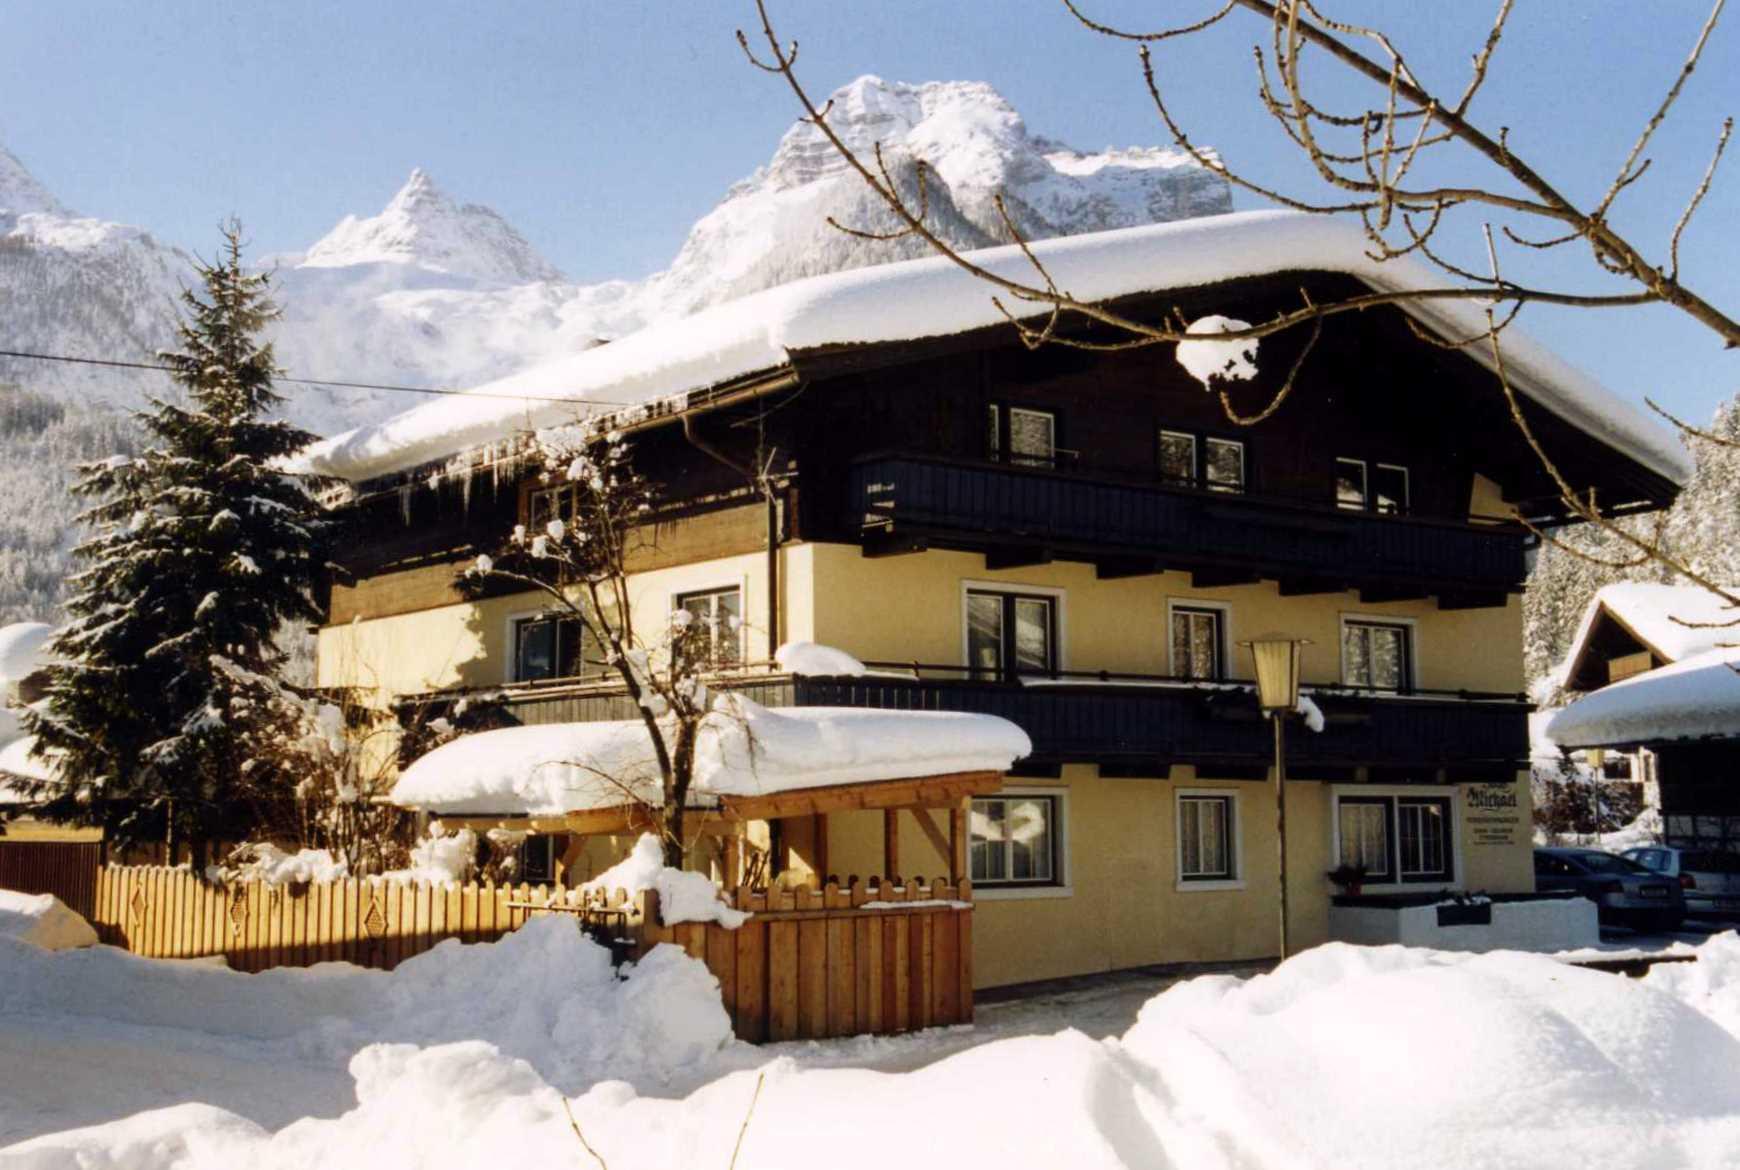 Appartement de vacances Waldemar Stainer, Haus Michael Apartment Mini =  1 Schlafraum/Bad, WC (1916625), Lofer, Pinzgau, Salzbourg, Autriche, image 8